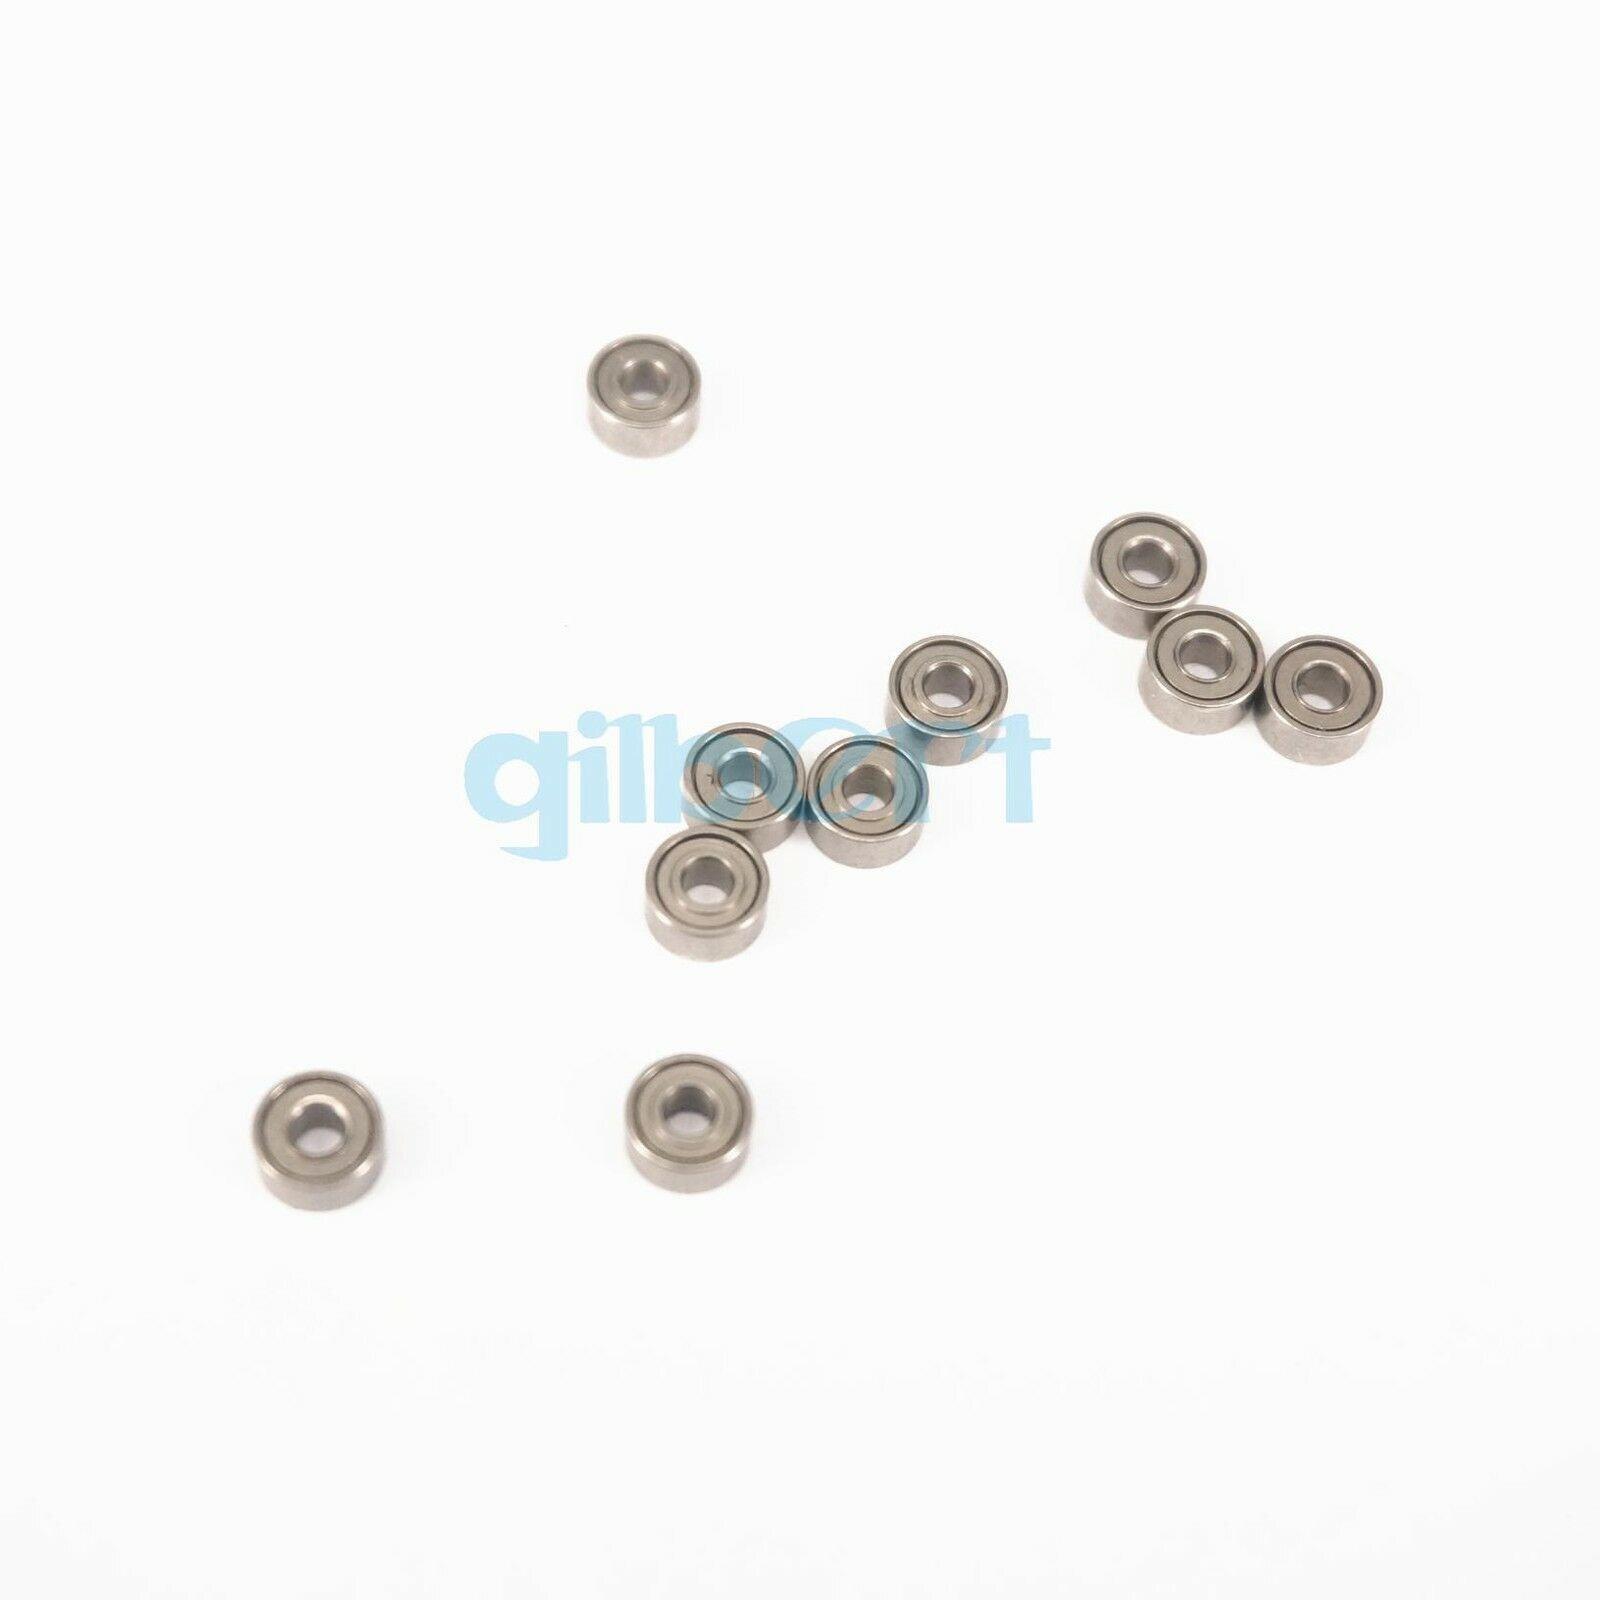 10pcs 1.5 X 4 X 2mm Micro Shielded Deep Groove Ball 681xZZ Model Radial Bearing